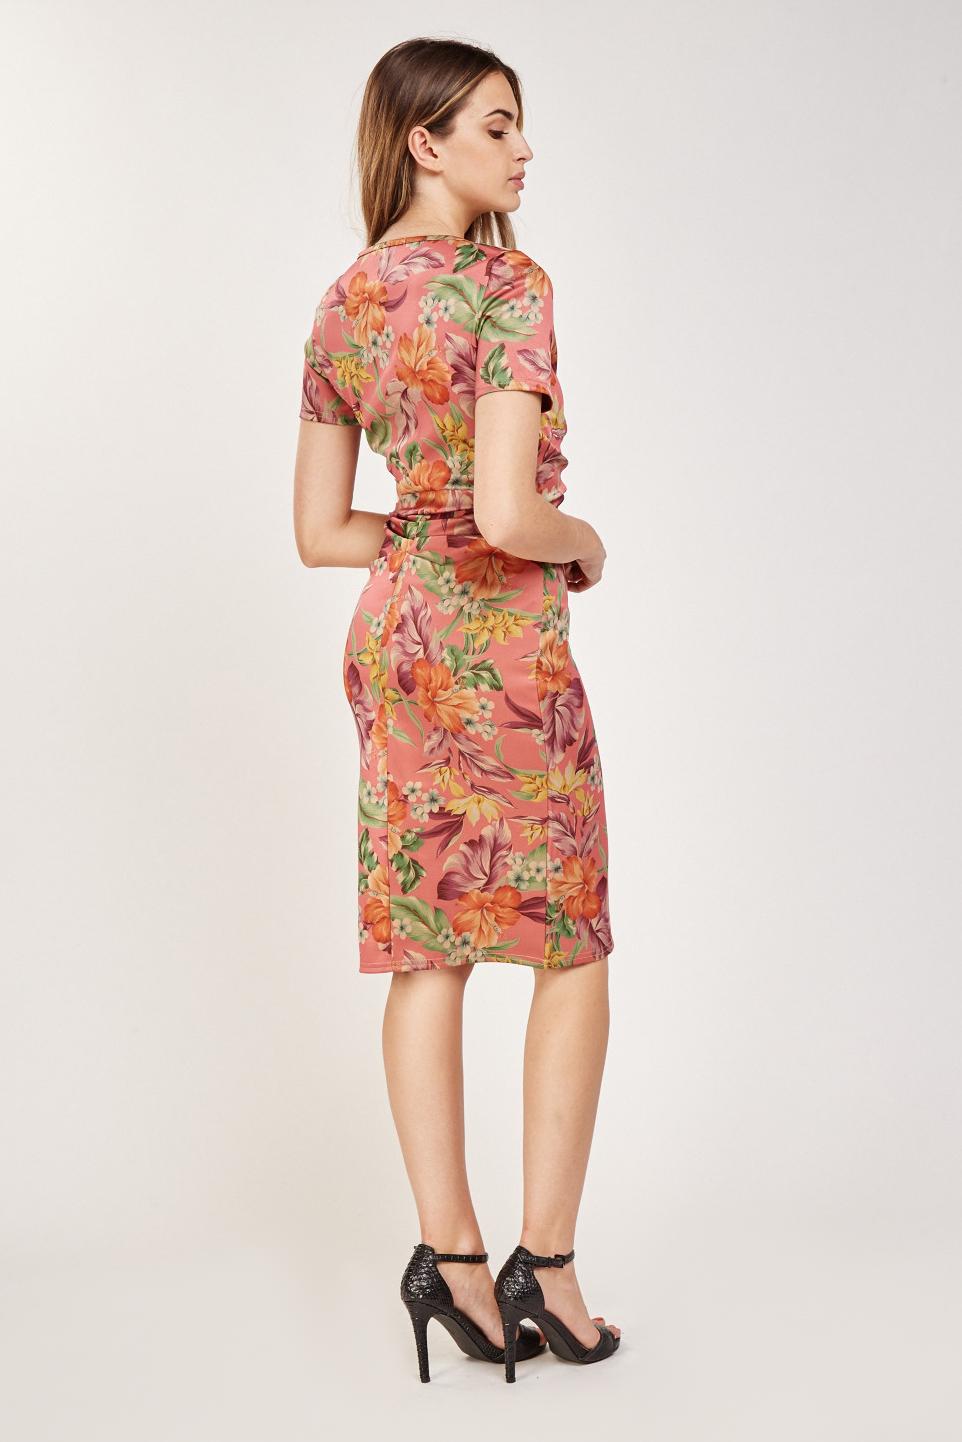 ebdc5929e2c365 Vintage Floral Print Midi Dress. Click on the image to zoom